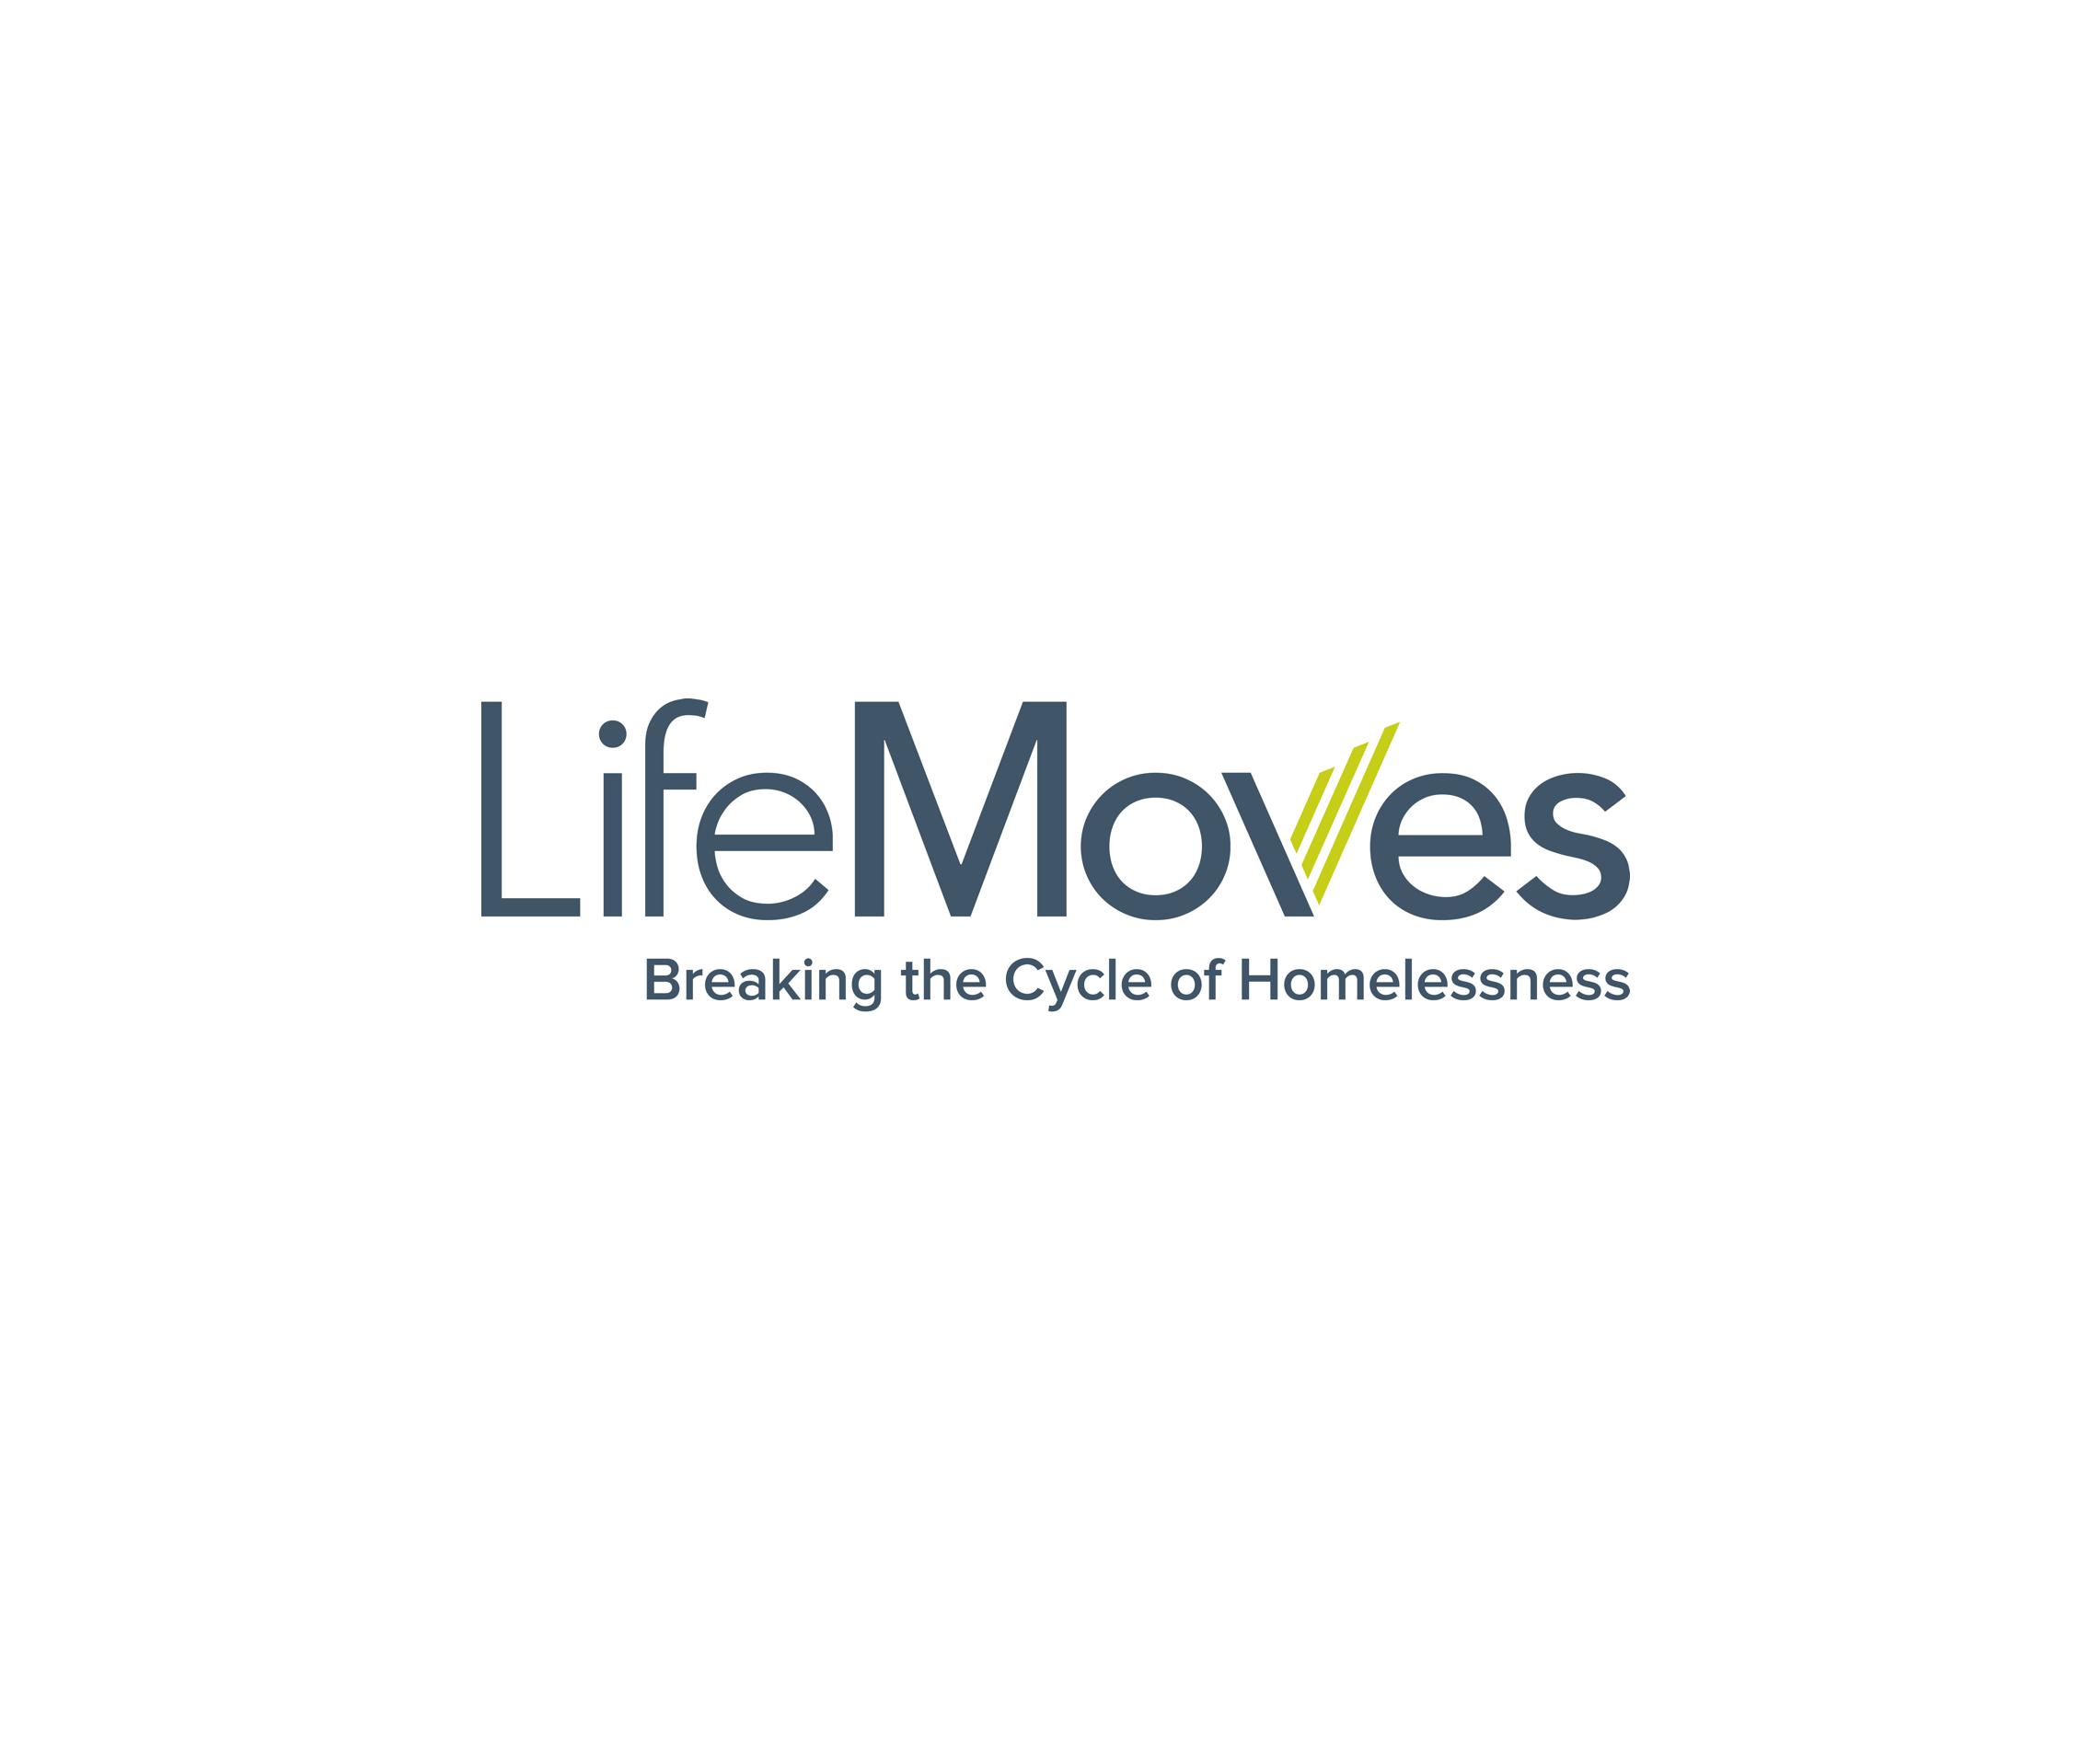 lifemoves-logo